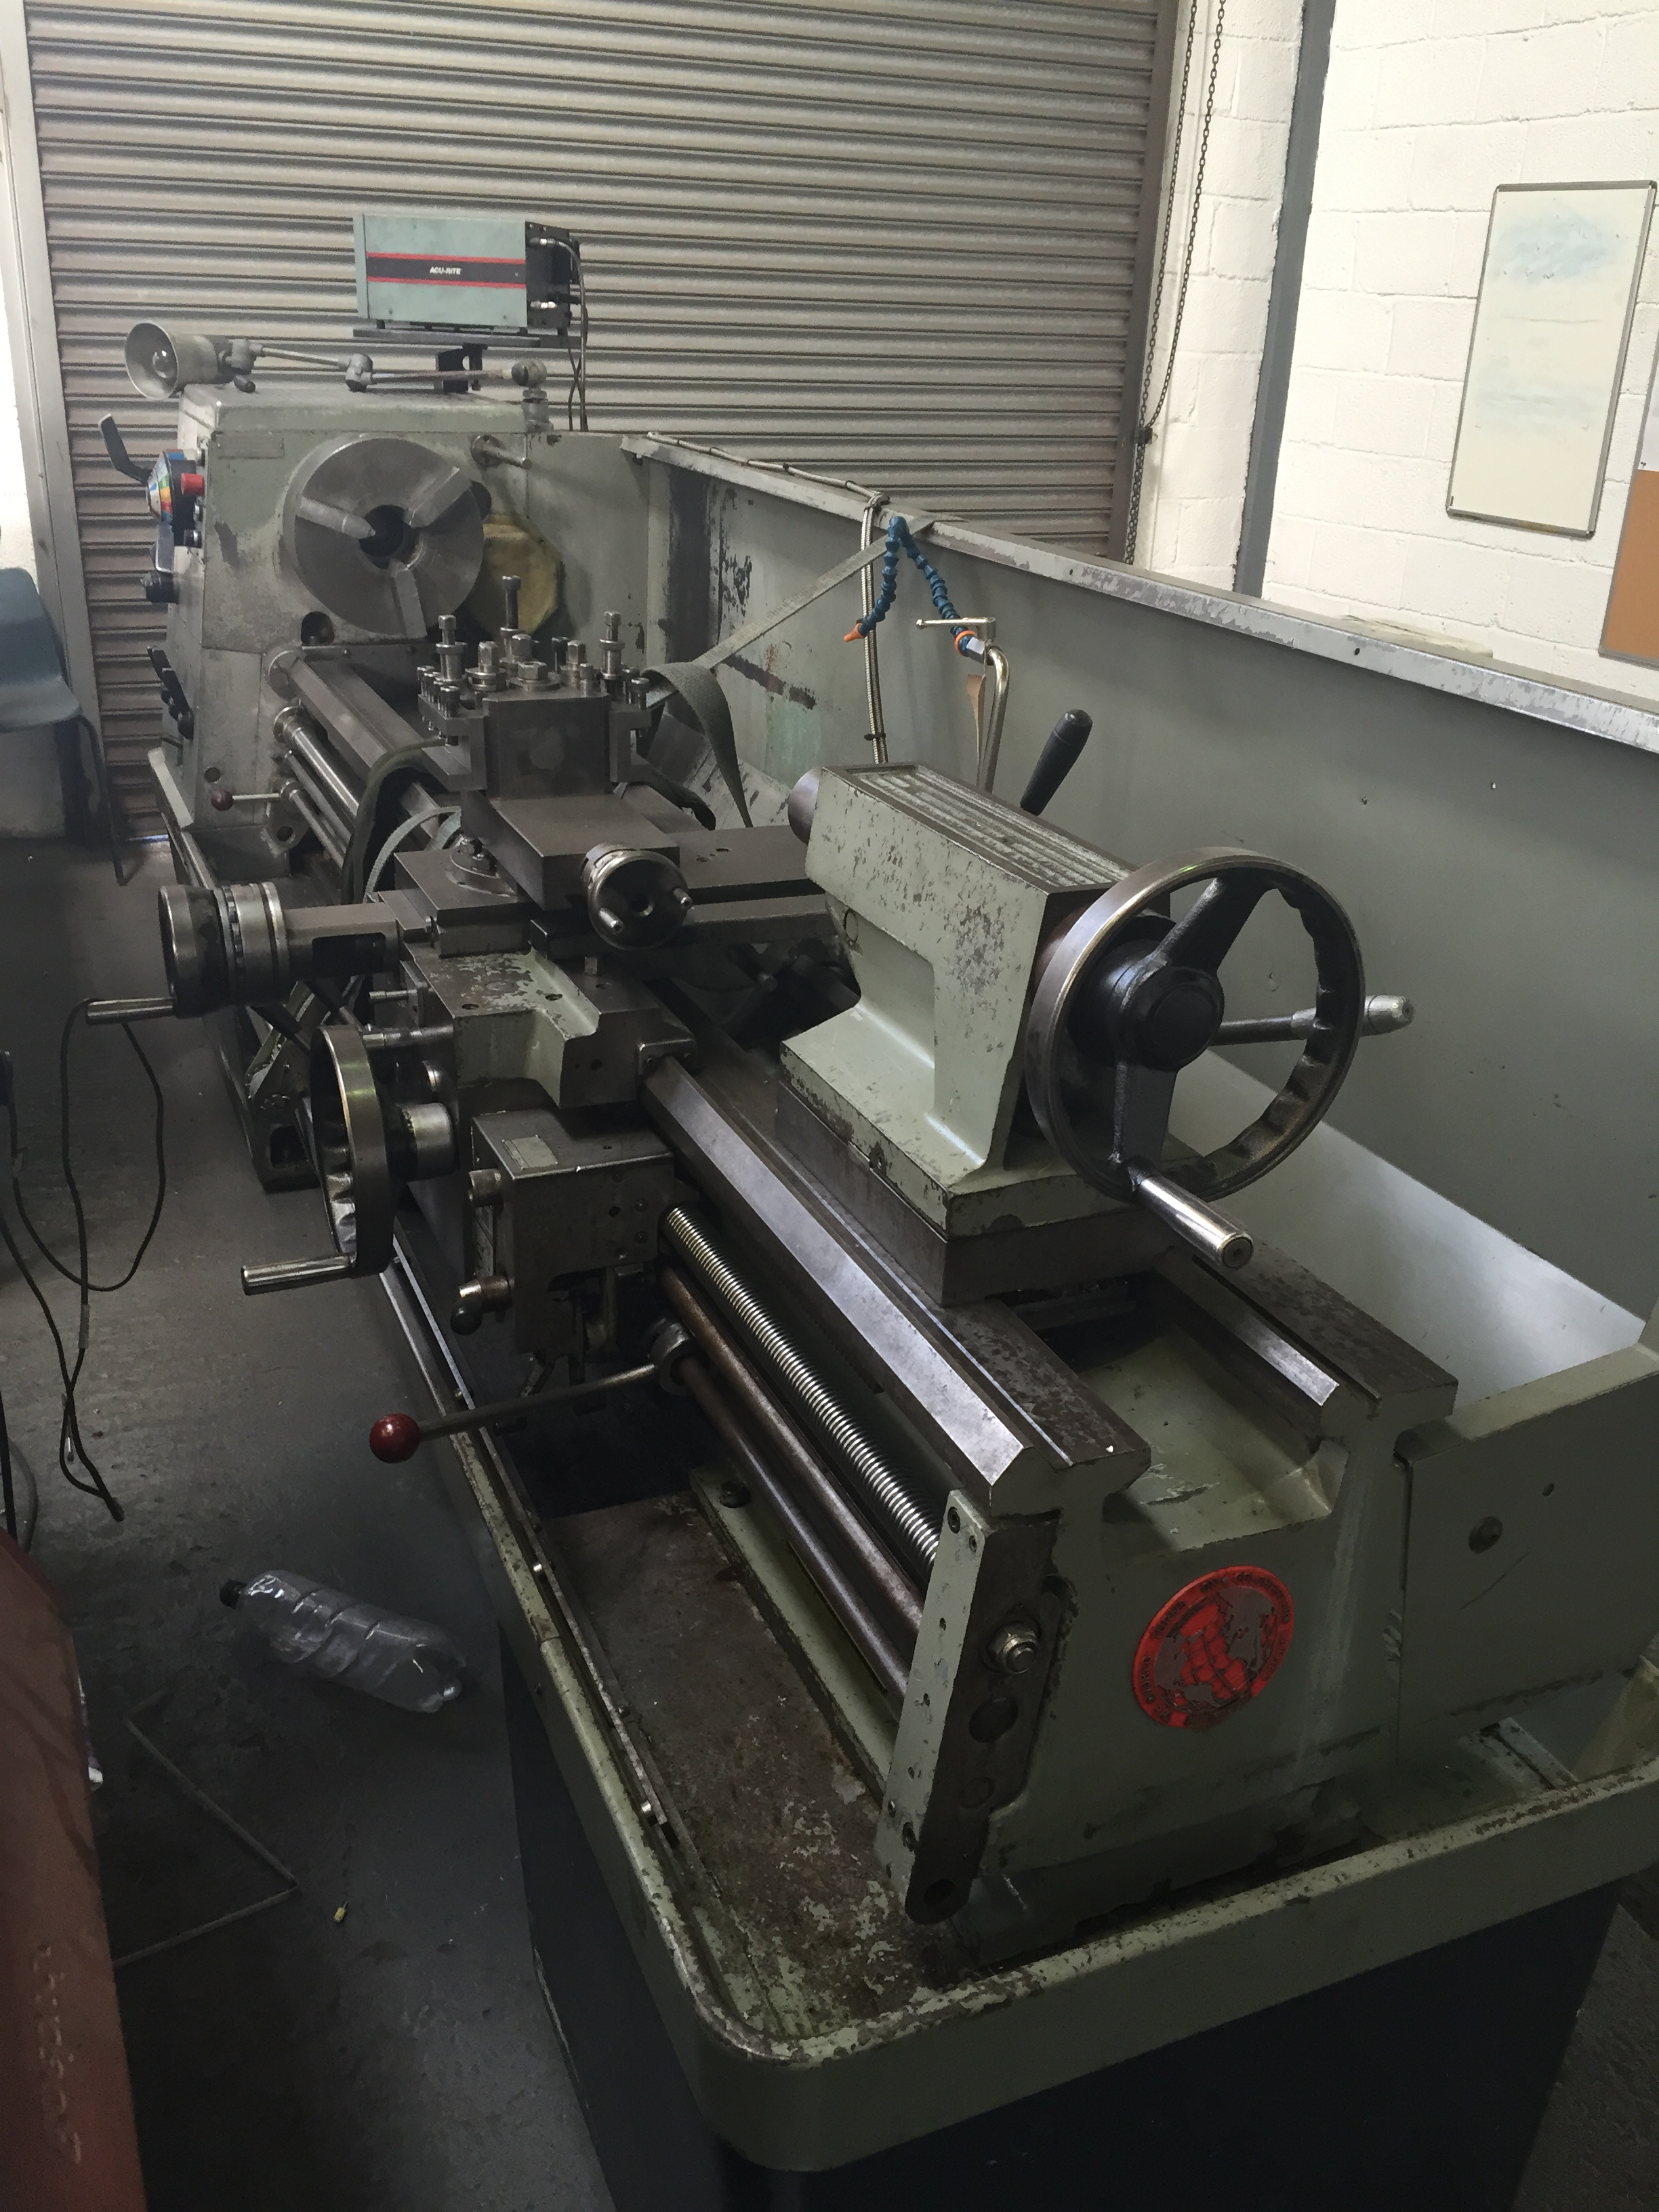 Electric Motor Carbon Brush Manufacturers Not Lossing Wiring Diagram Terminal Kit In Lulusosocom Lathe Manufacture Shafts Mawdsleys Ber Brushes Dc